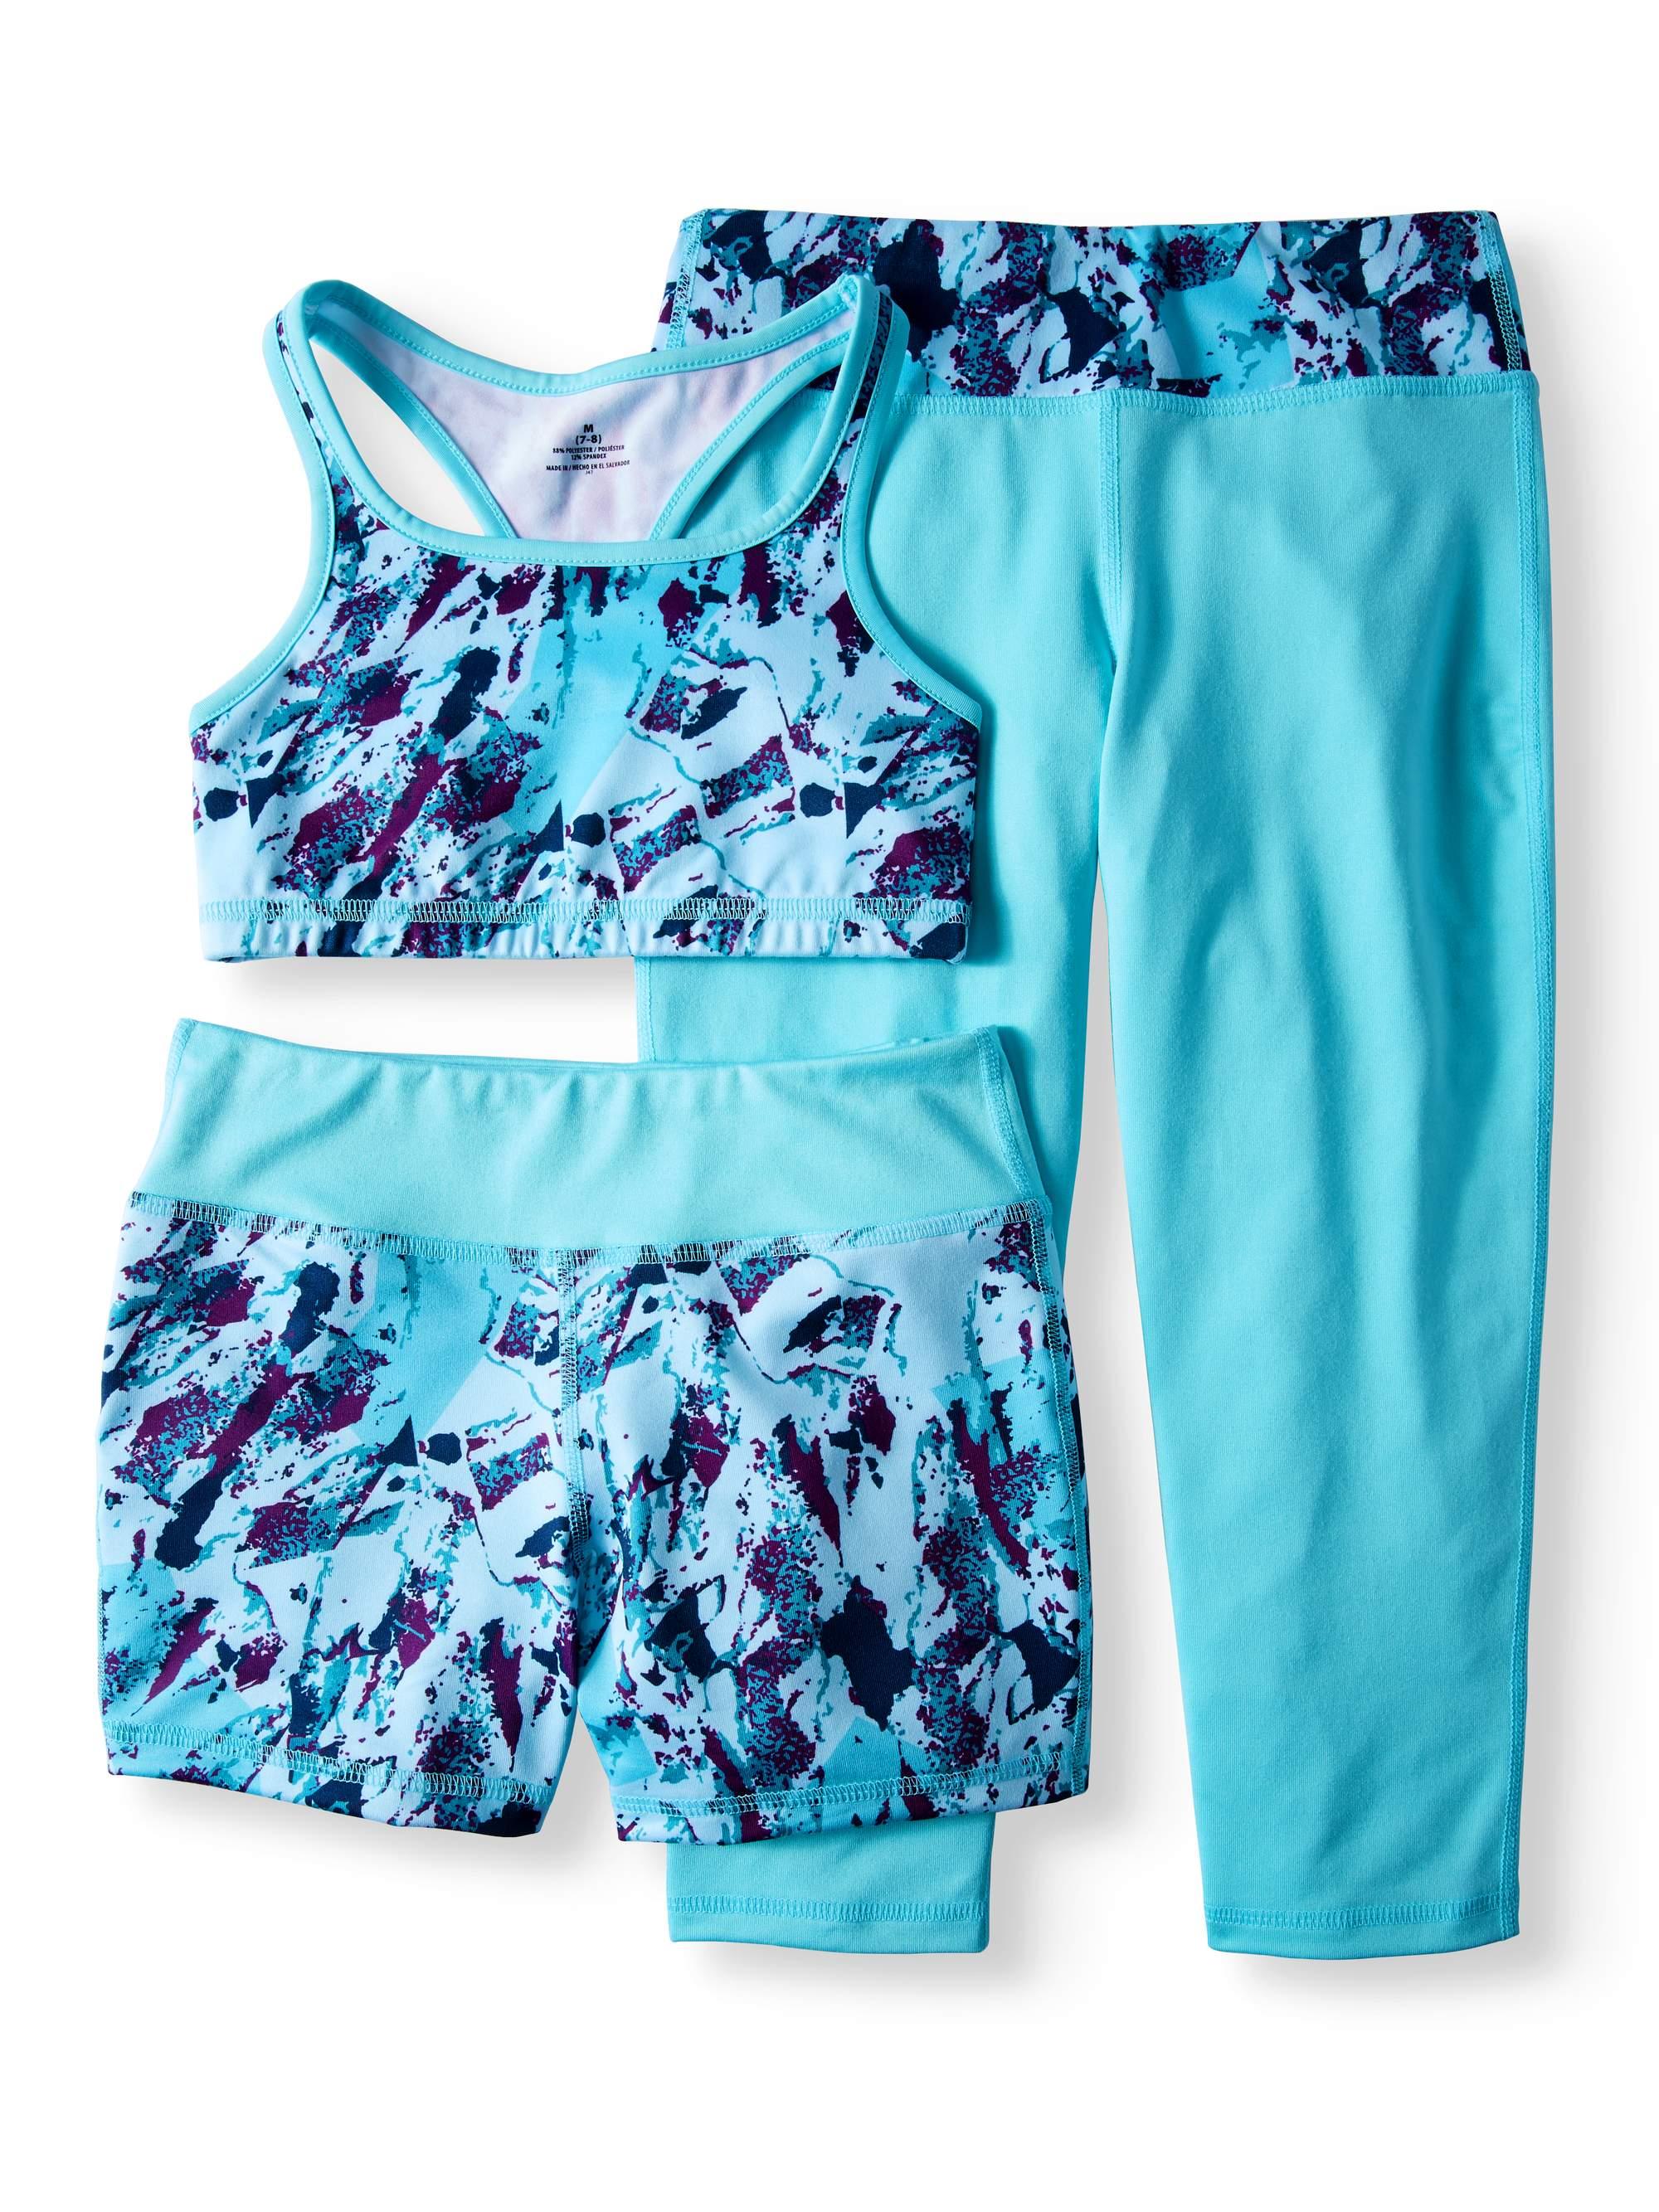 Girls' Performance Sports Bra, Bike Short, And Capri Legging 3-Piece Active Set